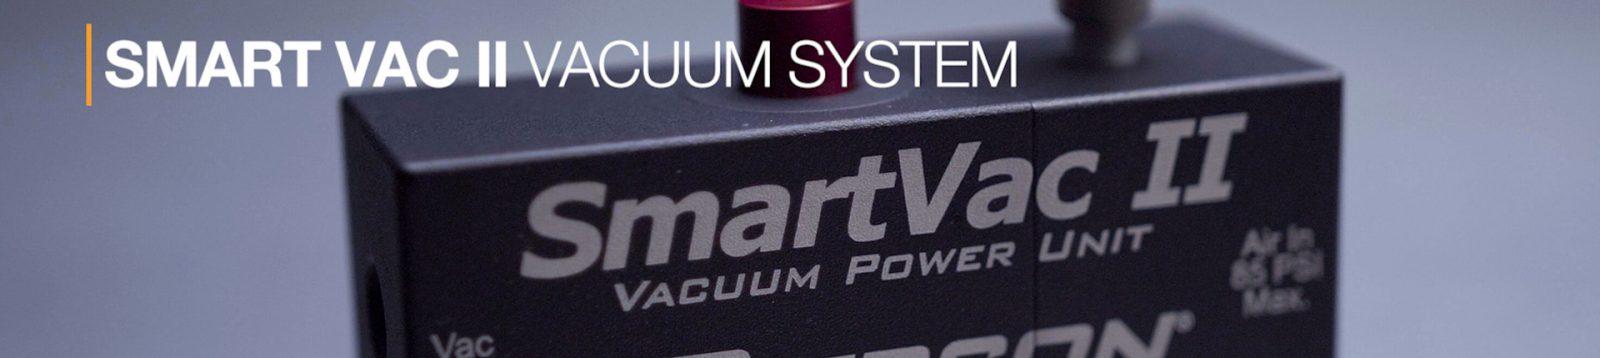 SmartVac II Vacuum System Header